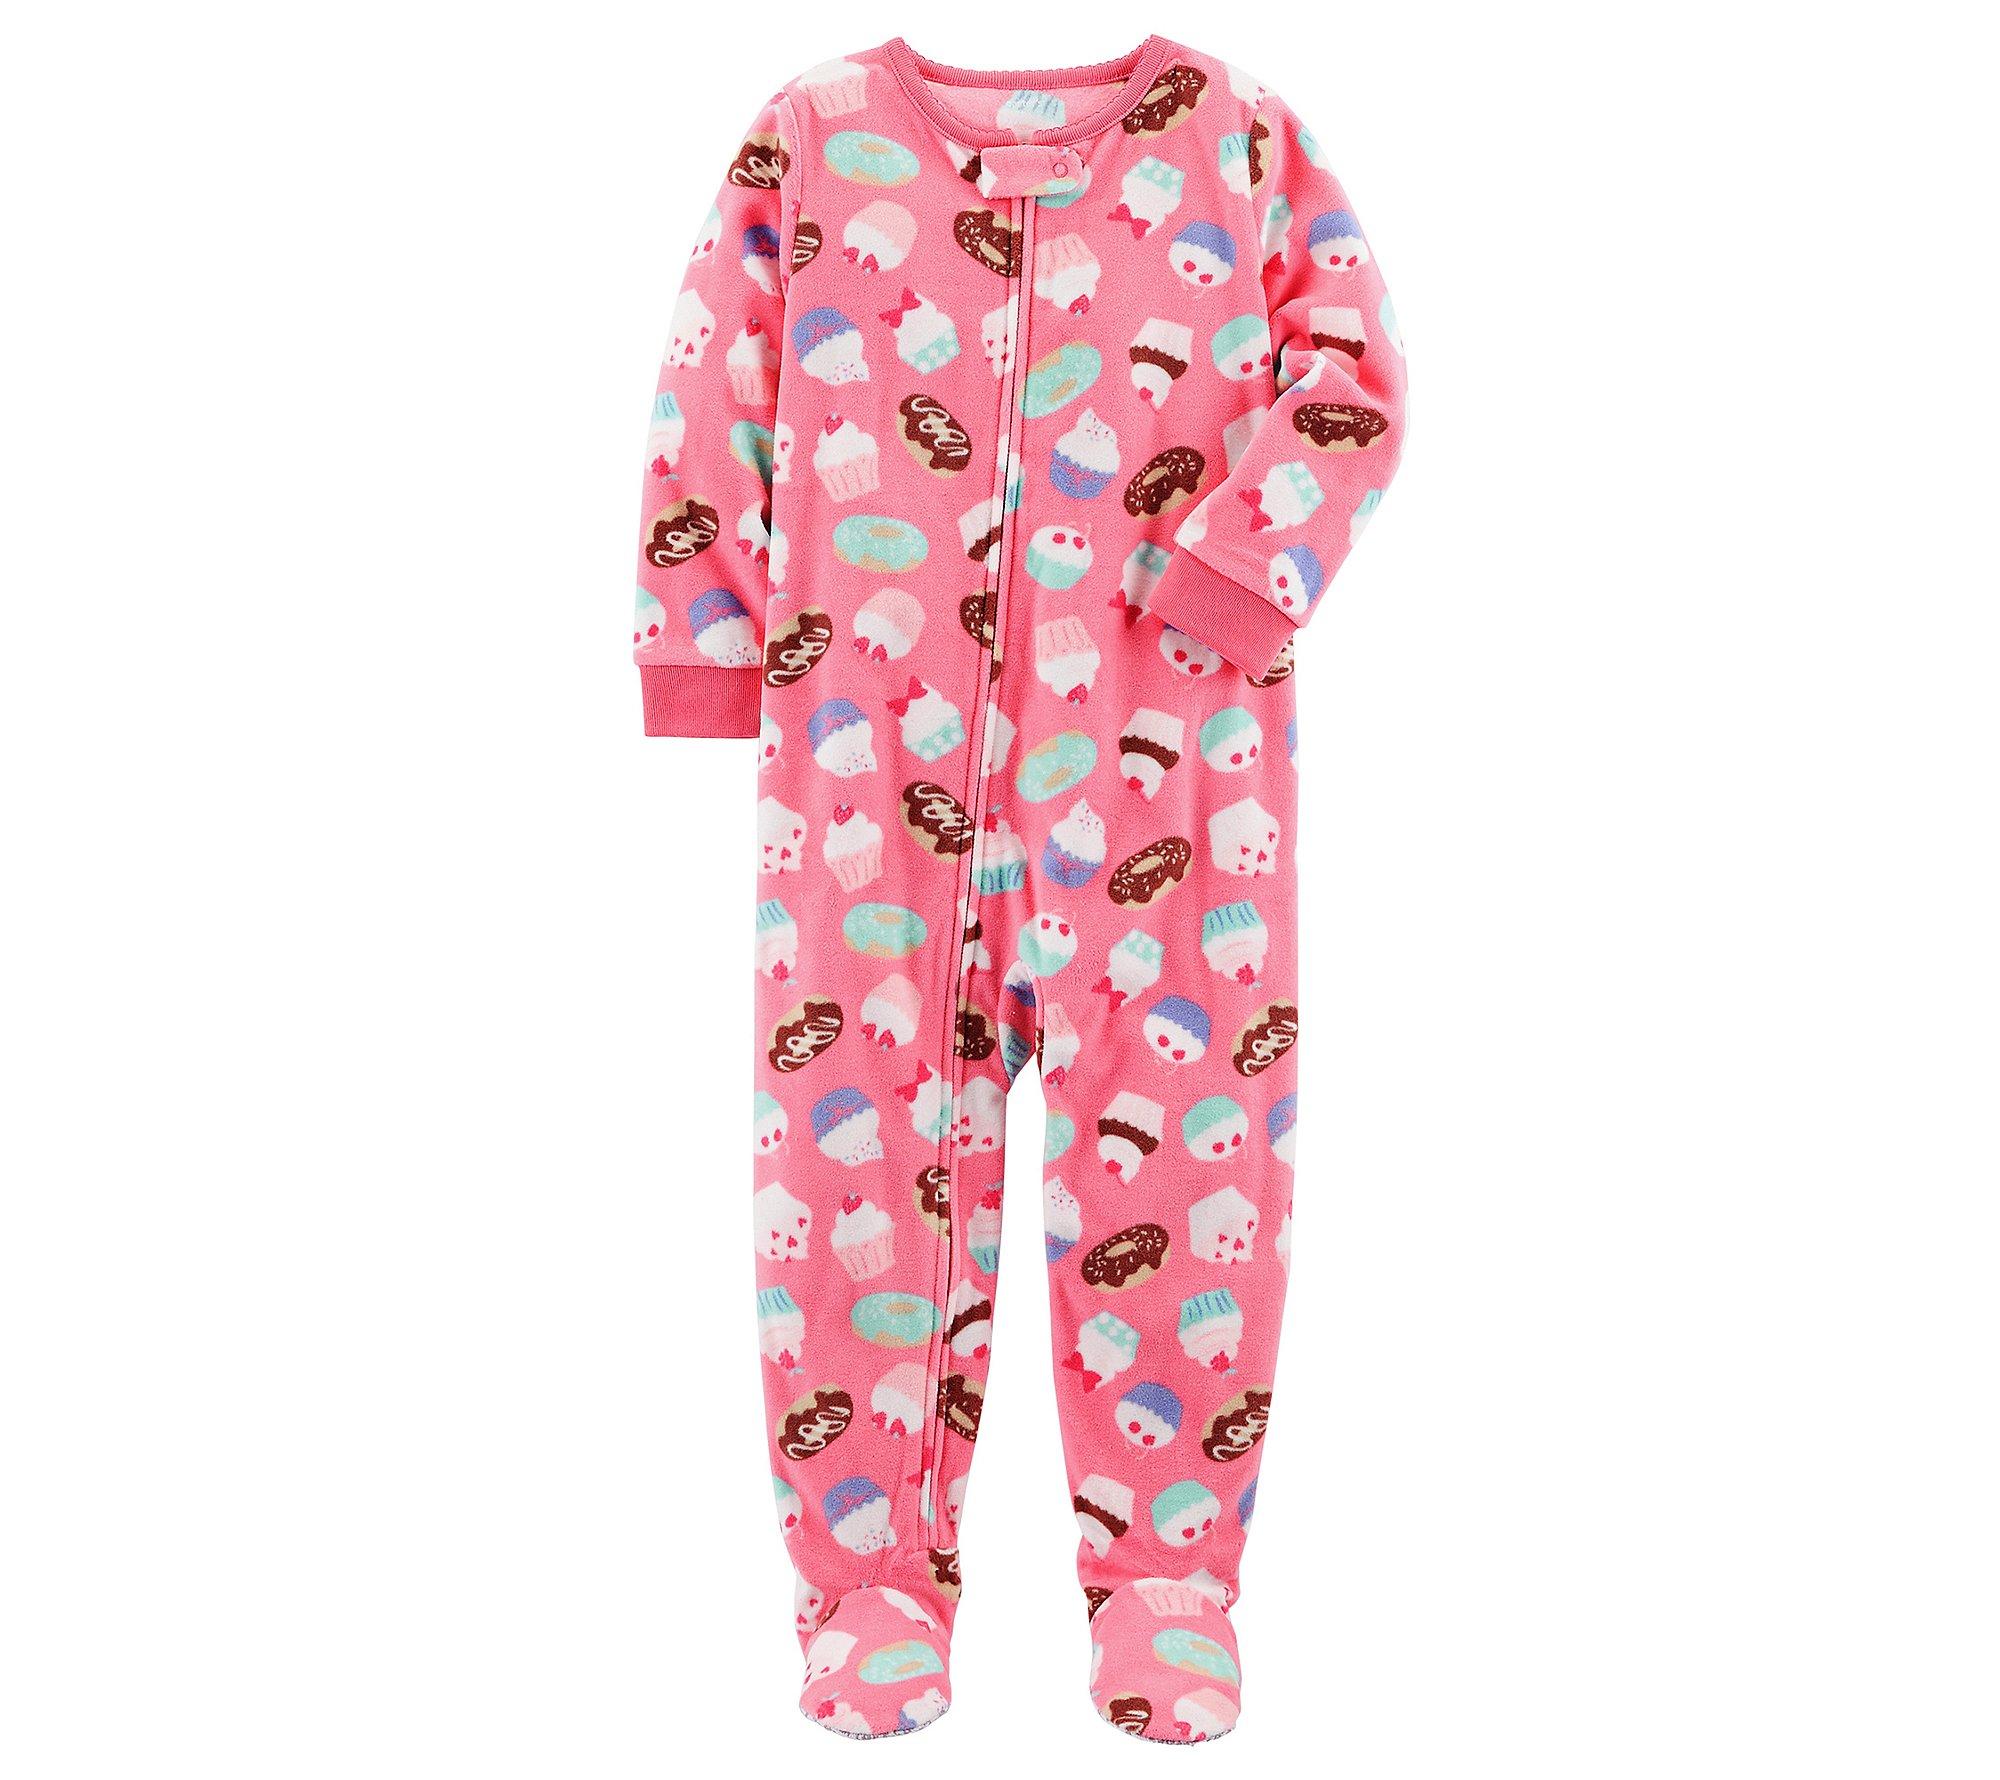 me coverall sleep monkey for blanket fleece ip sleepers warm play winter piece infant pajamas baby one romper little n footie gray footed sleeper boys feet